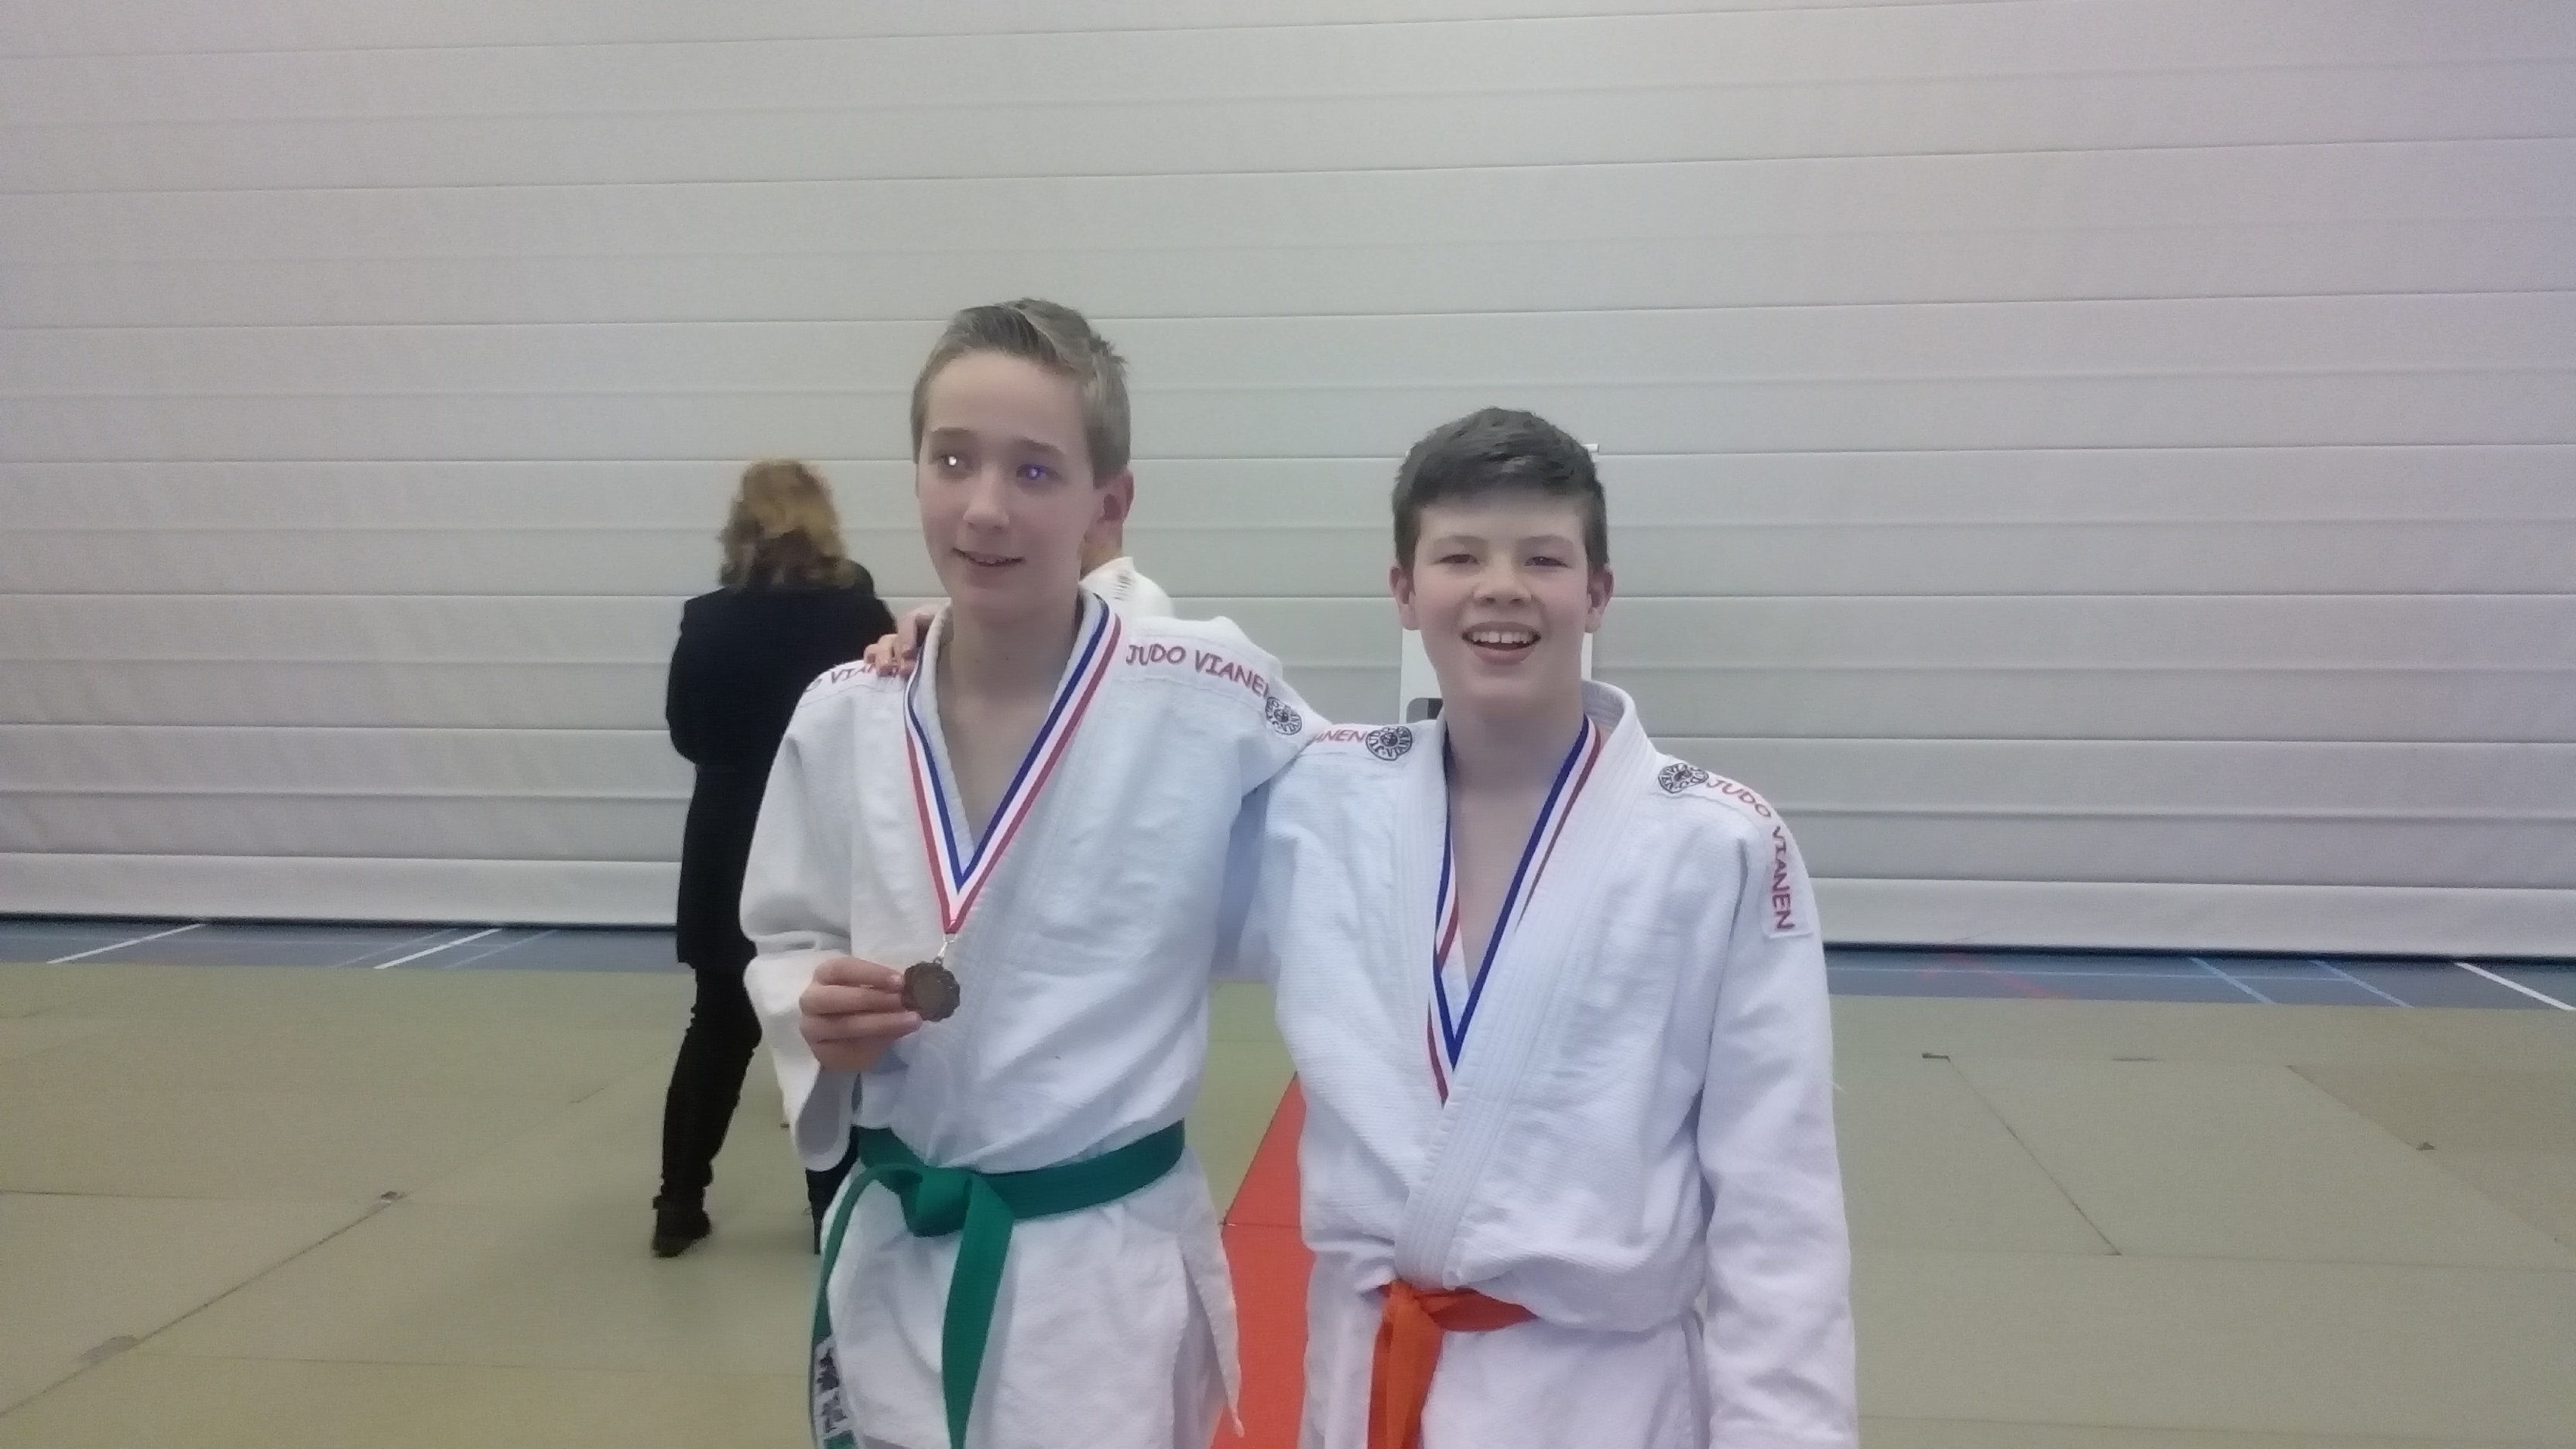 Judoka pakken medailles op ne-waza toernooi